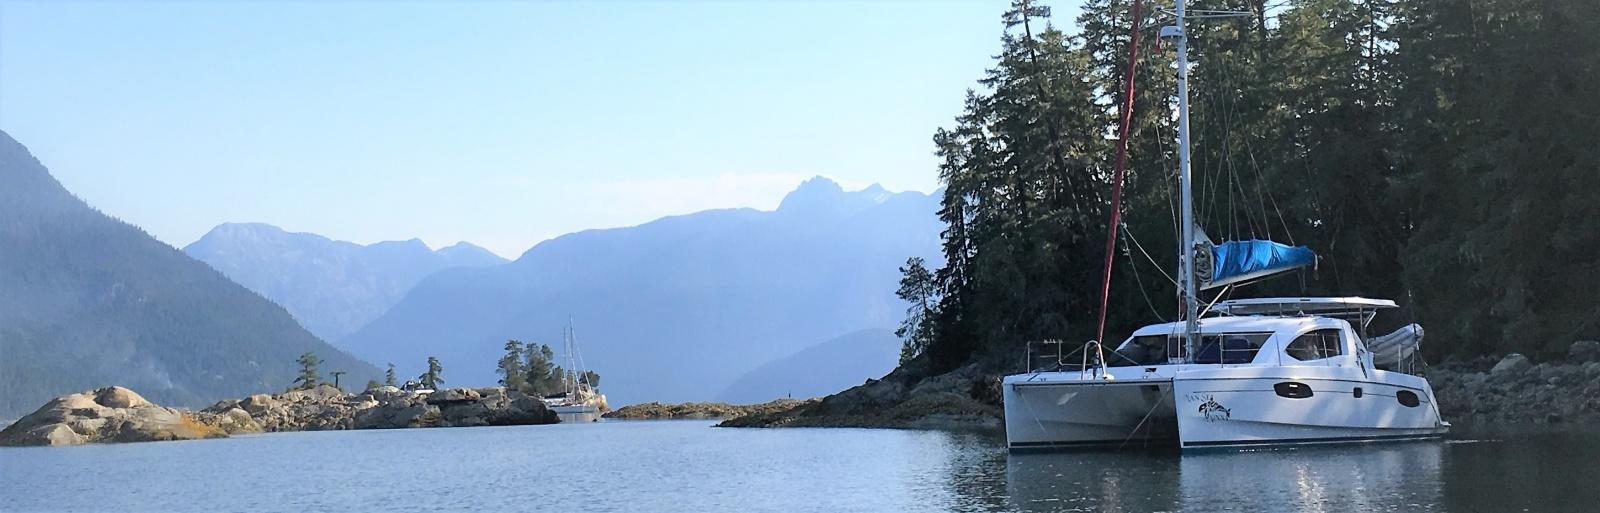 Click image for larger version  Name:header boat (2).jpg Views:139 Size:254.1 KB ID:177442